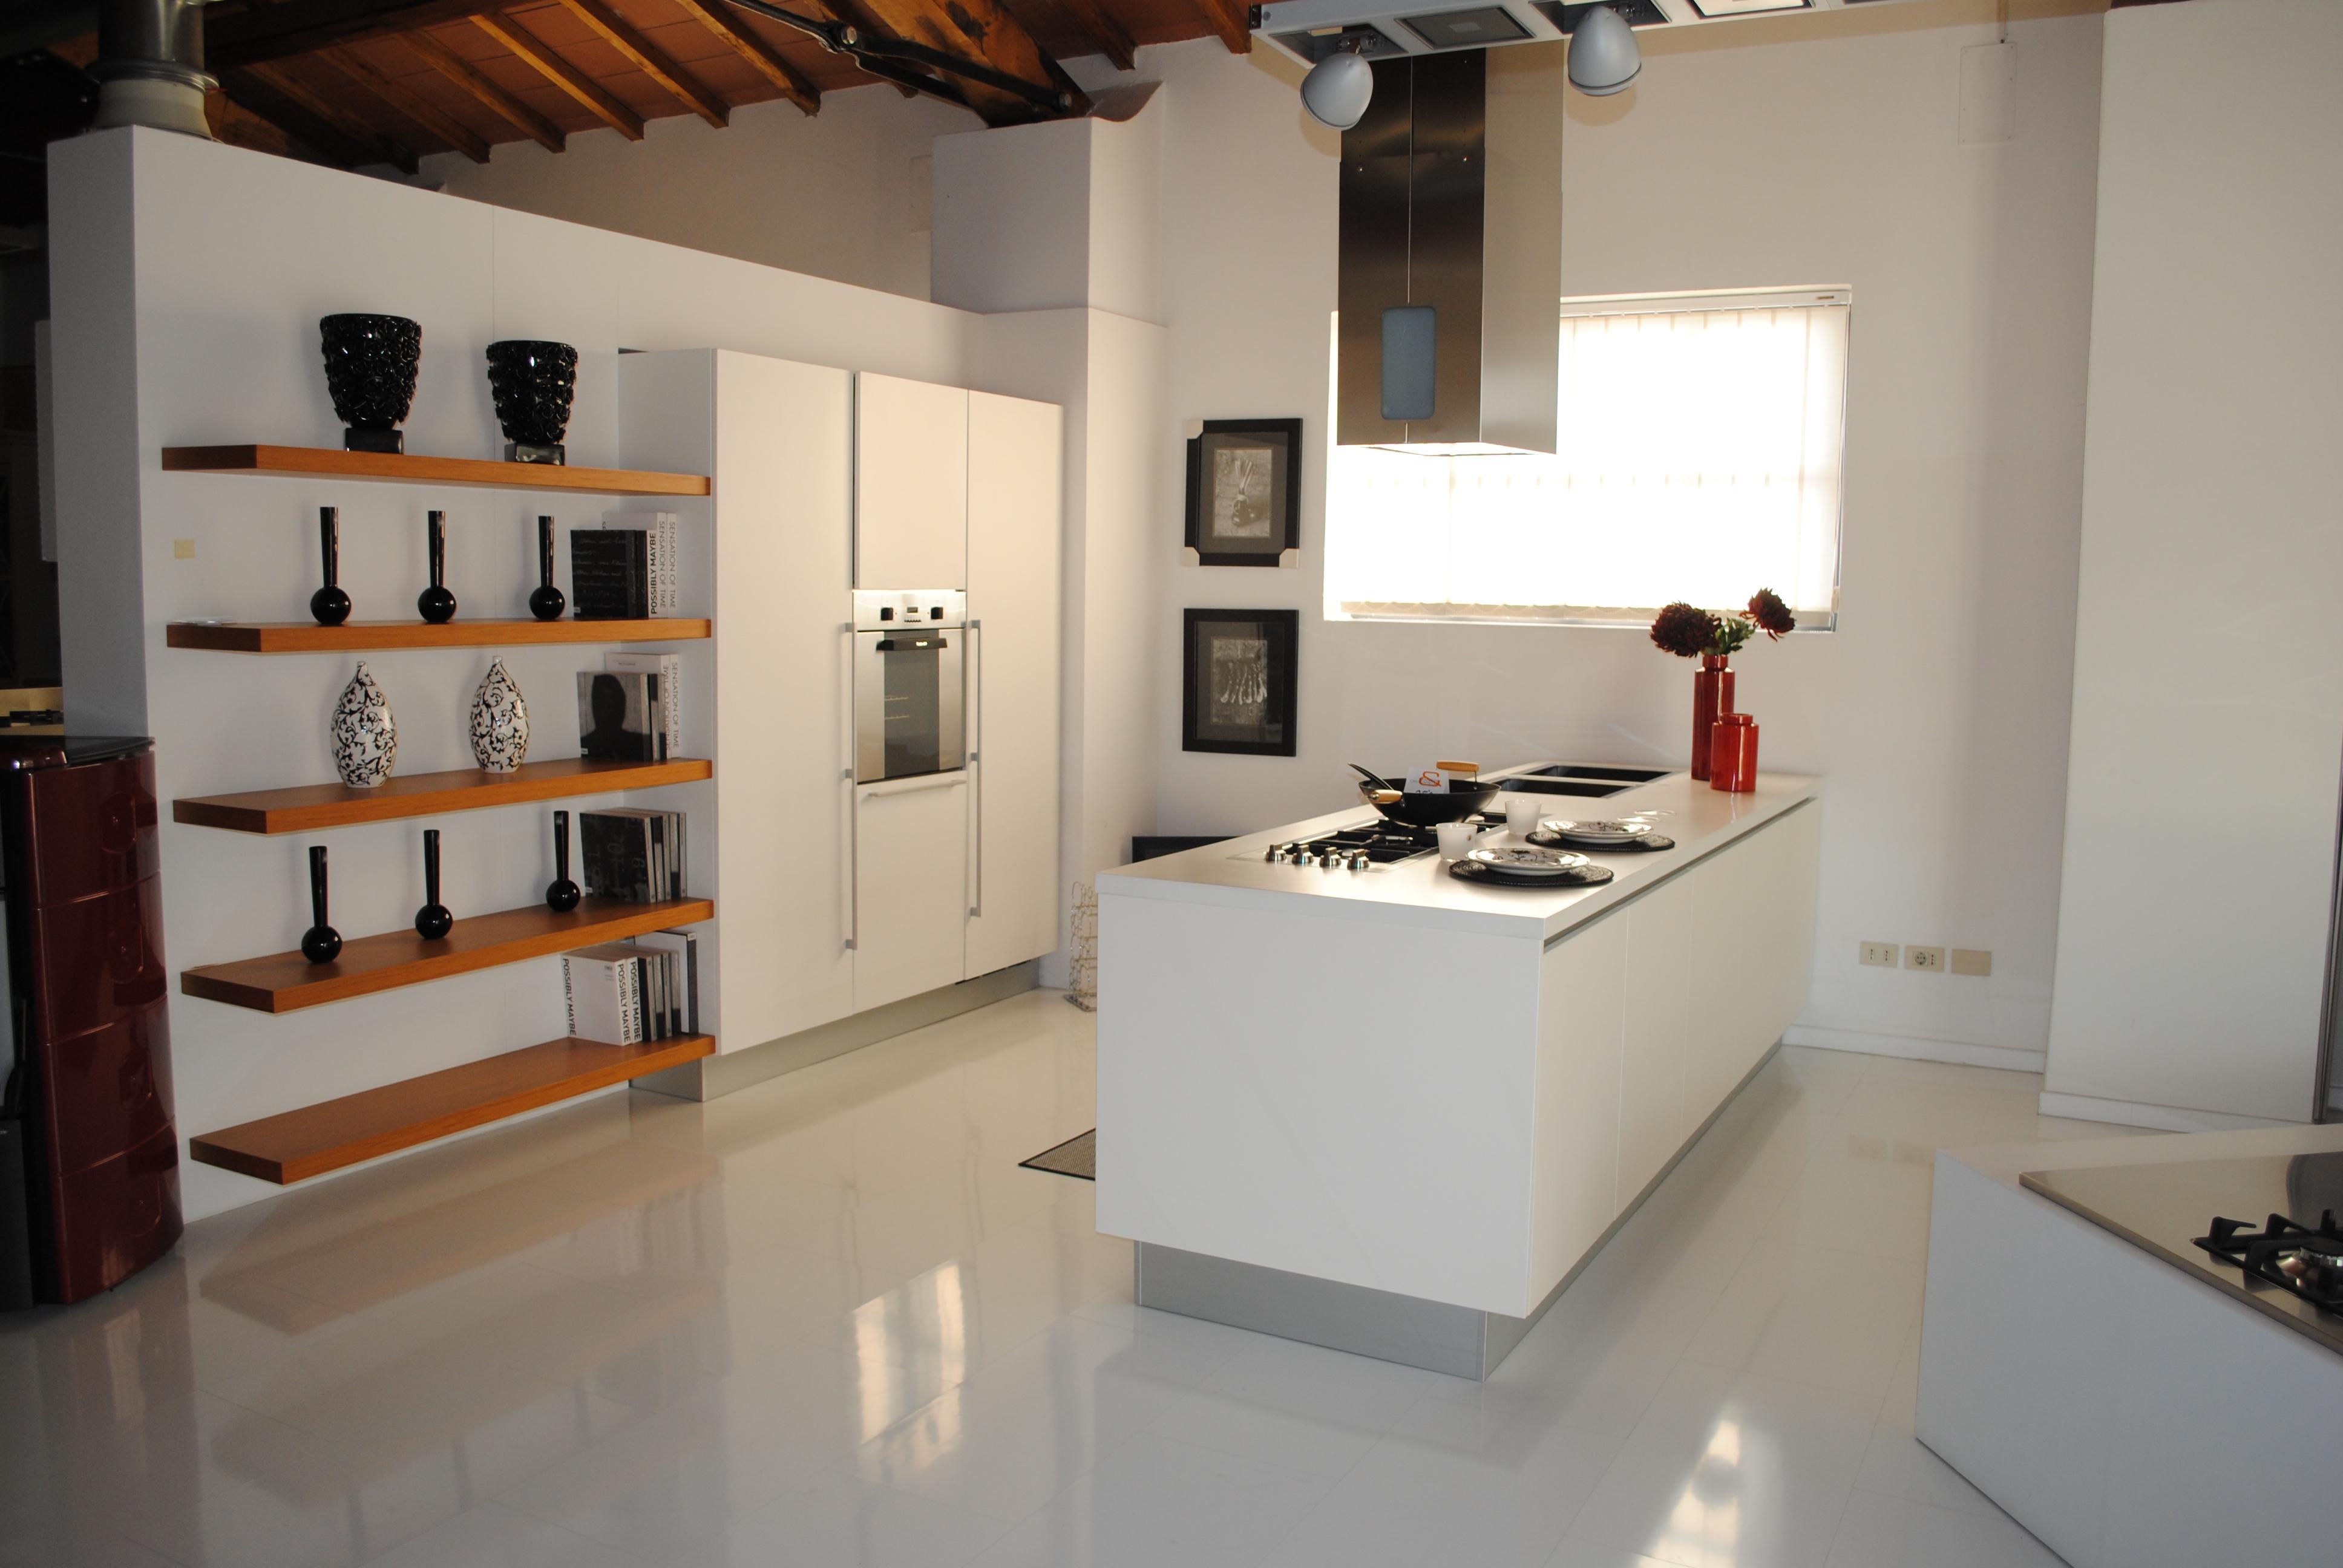 Awesome Cucina Flux Scavolini Prezzo Gallery - Acomo.us - acomo.us